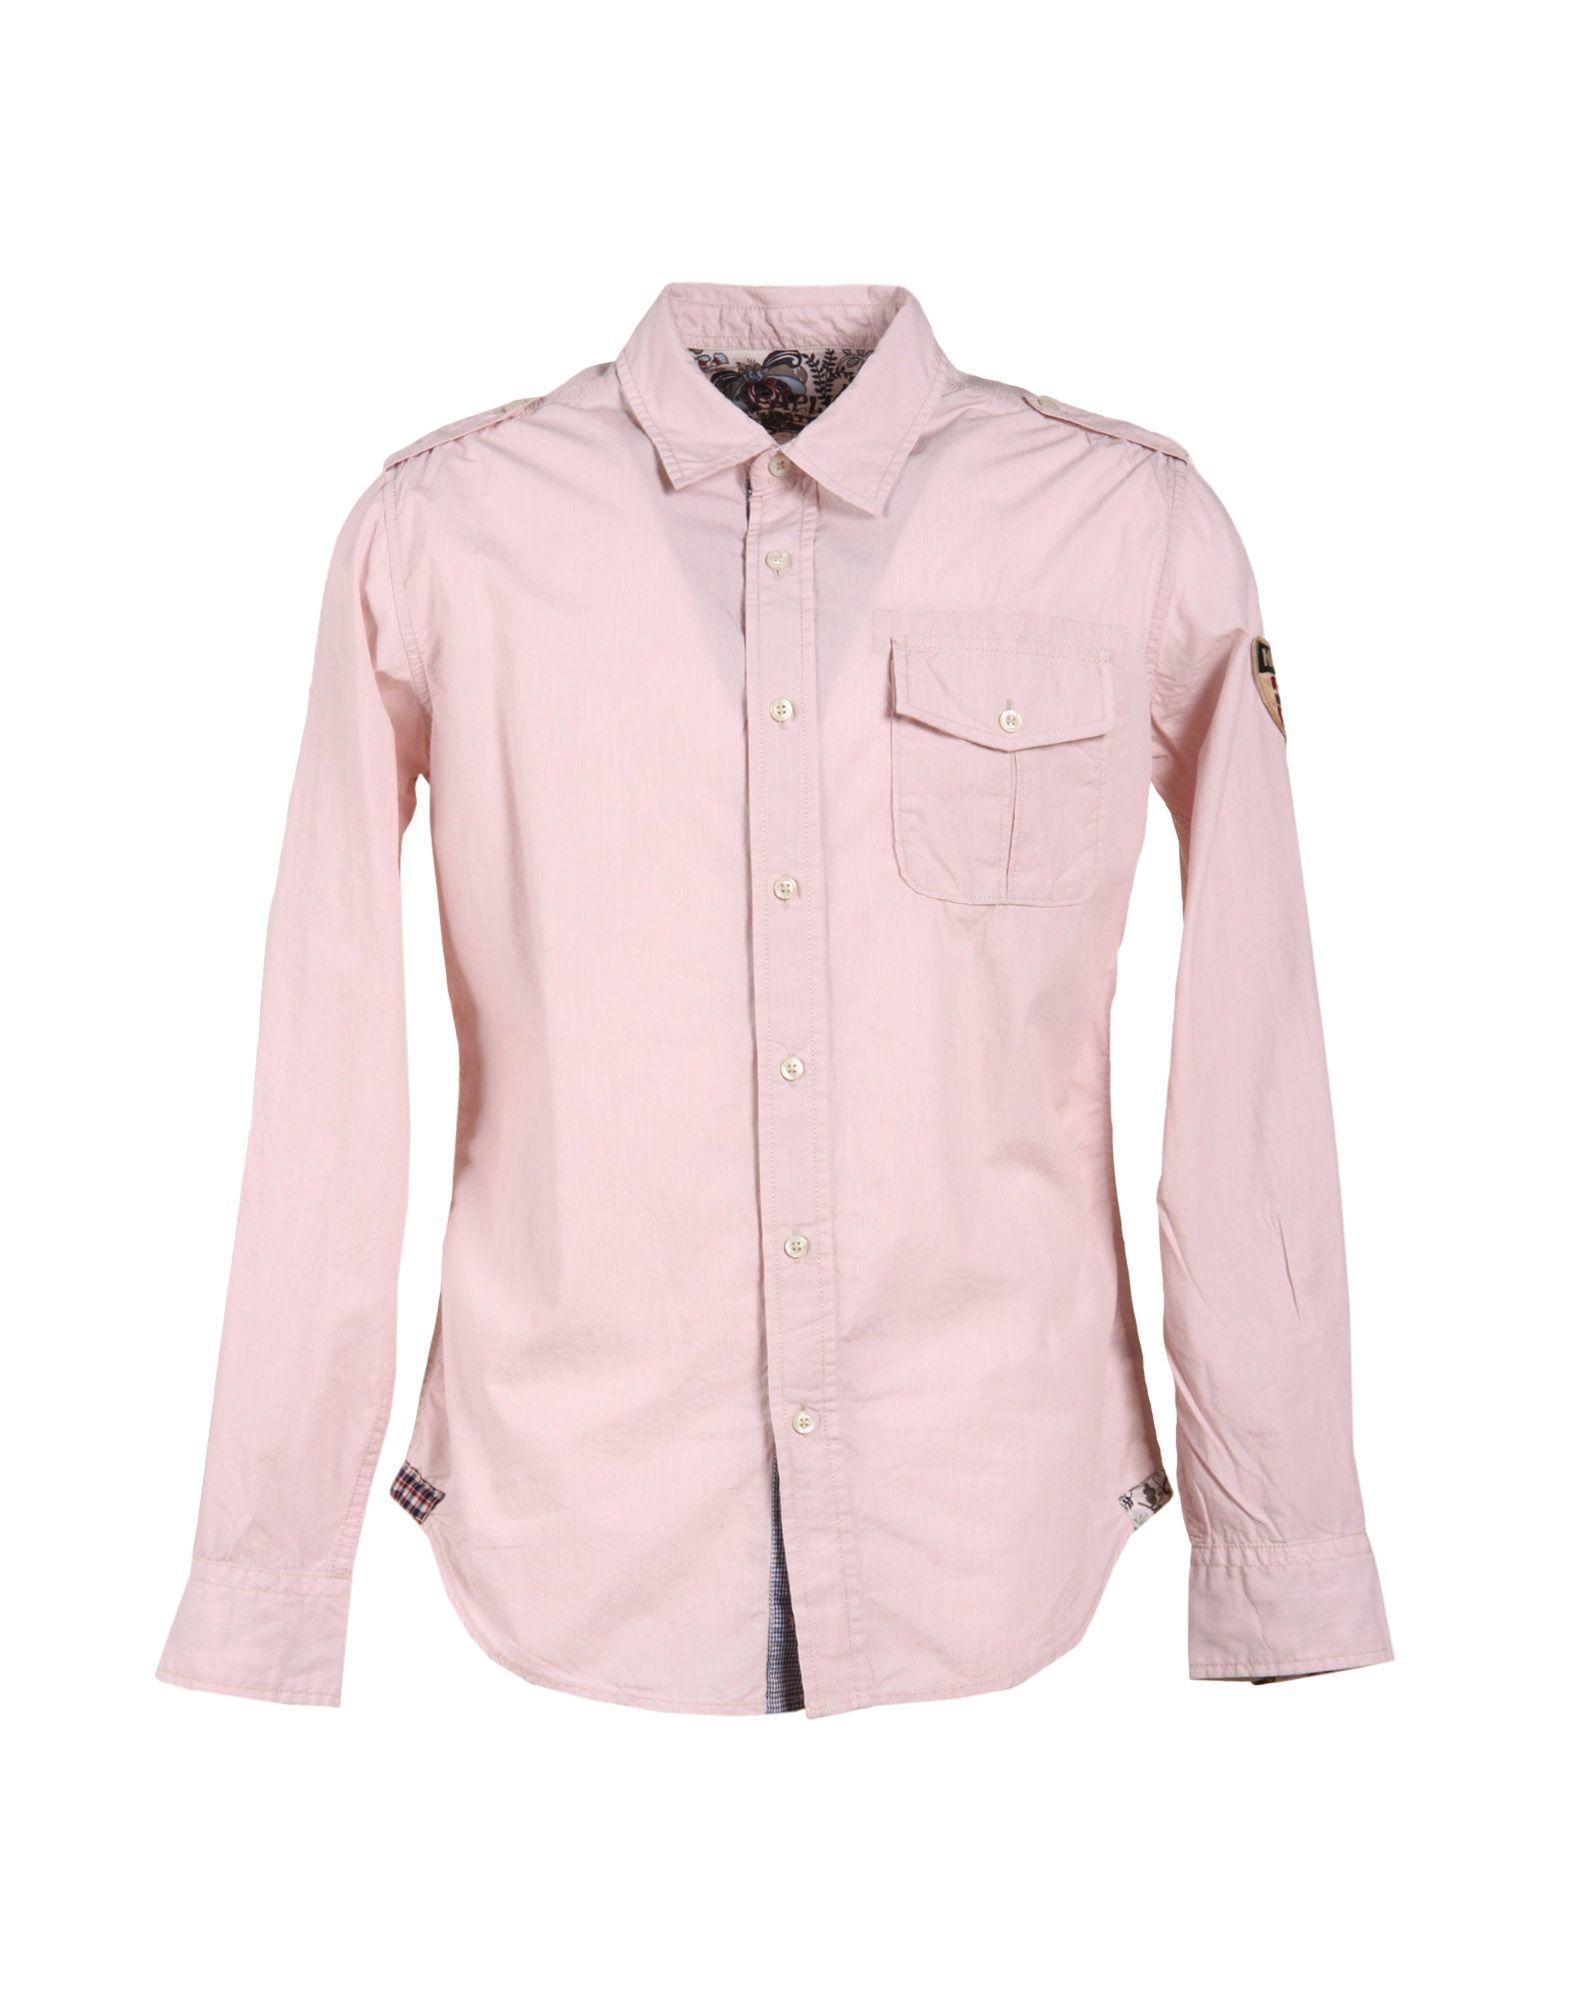 Napapijri long sleeve shirt in pink for men light pink for Mens pink long sleeve shirt